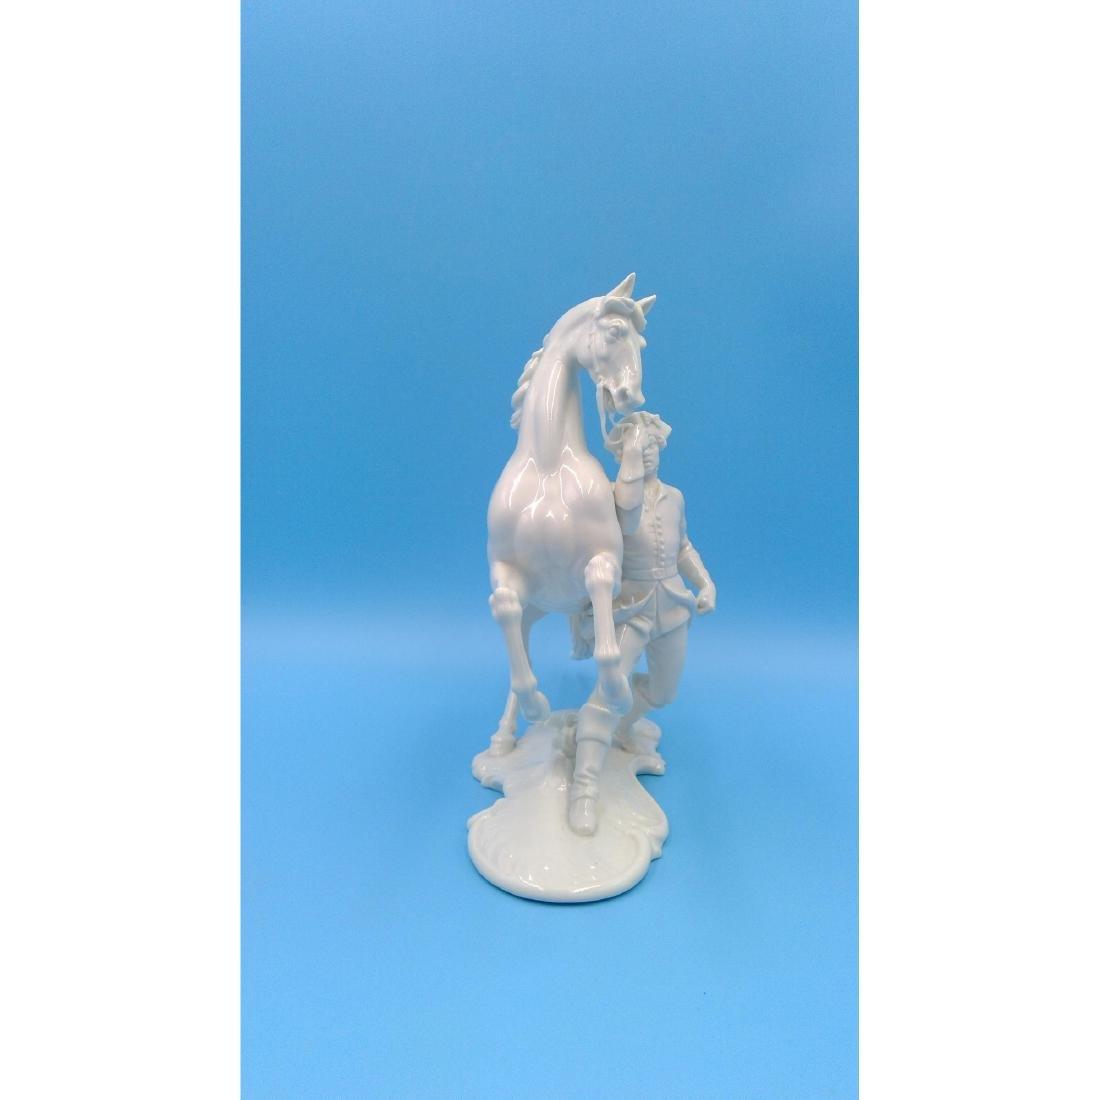 NYMPHENBURG GERMAN PORCELAIN FIGURINE HORSE RIDER - 4